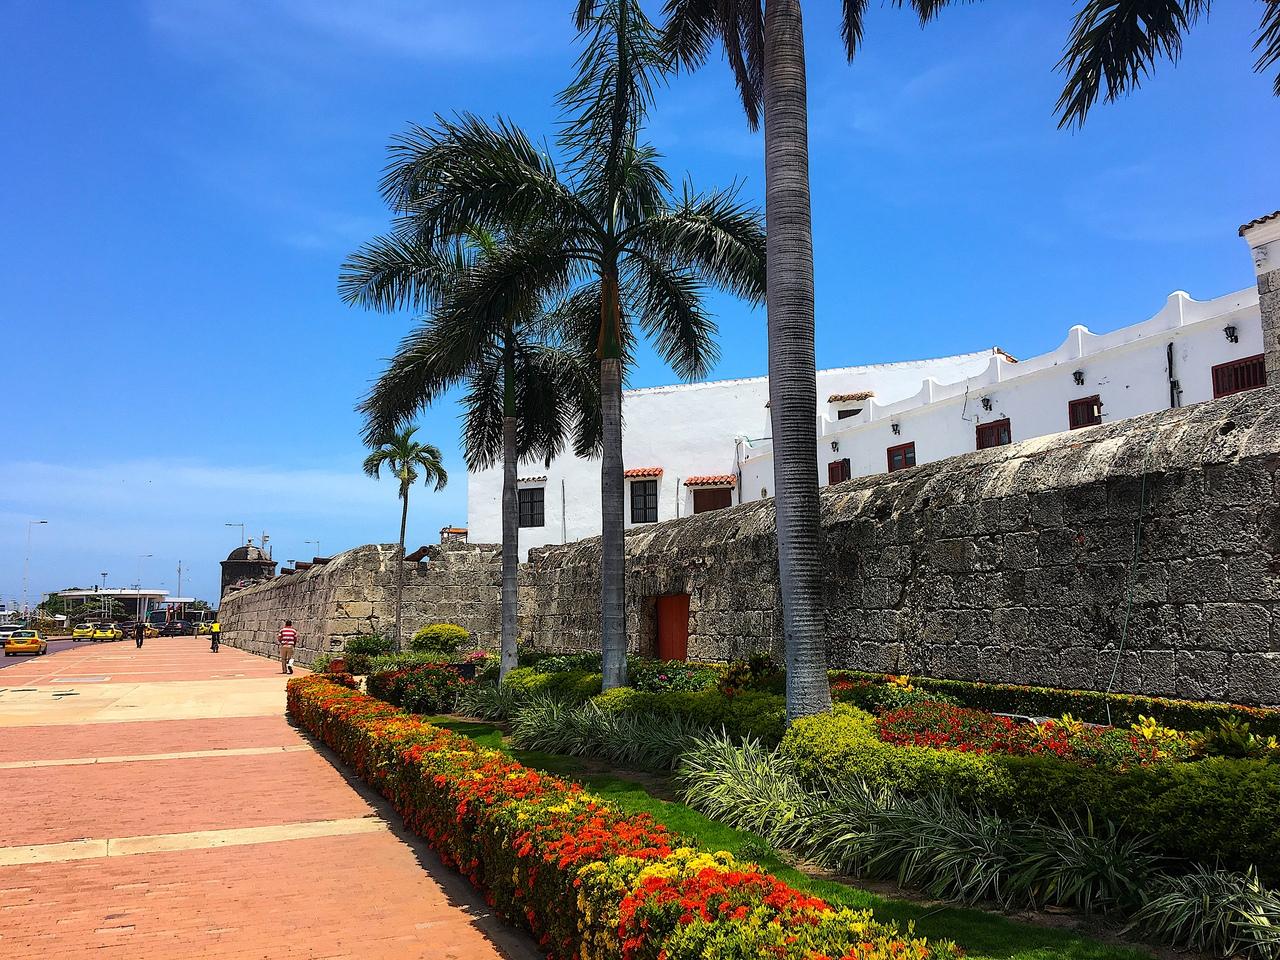 Стена вокруг старого города. Картахена, Колумбия